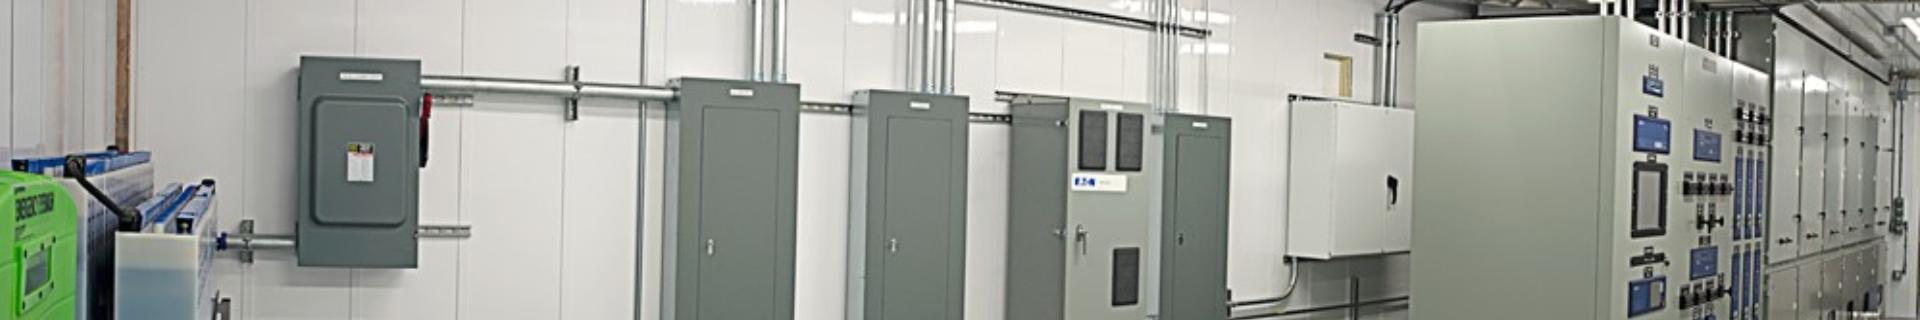 Basic Electrical Safety Awareness